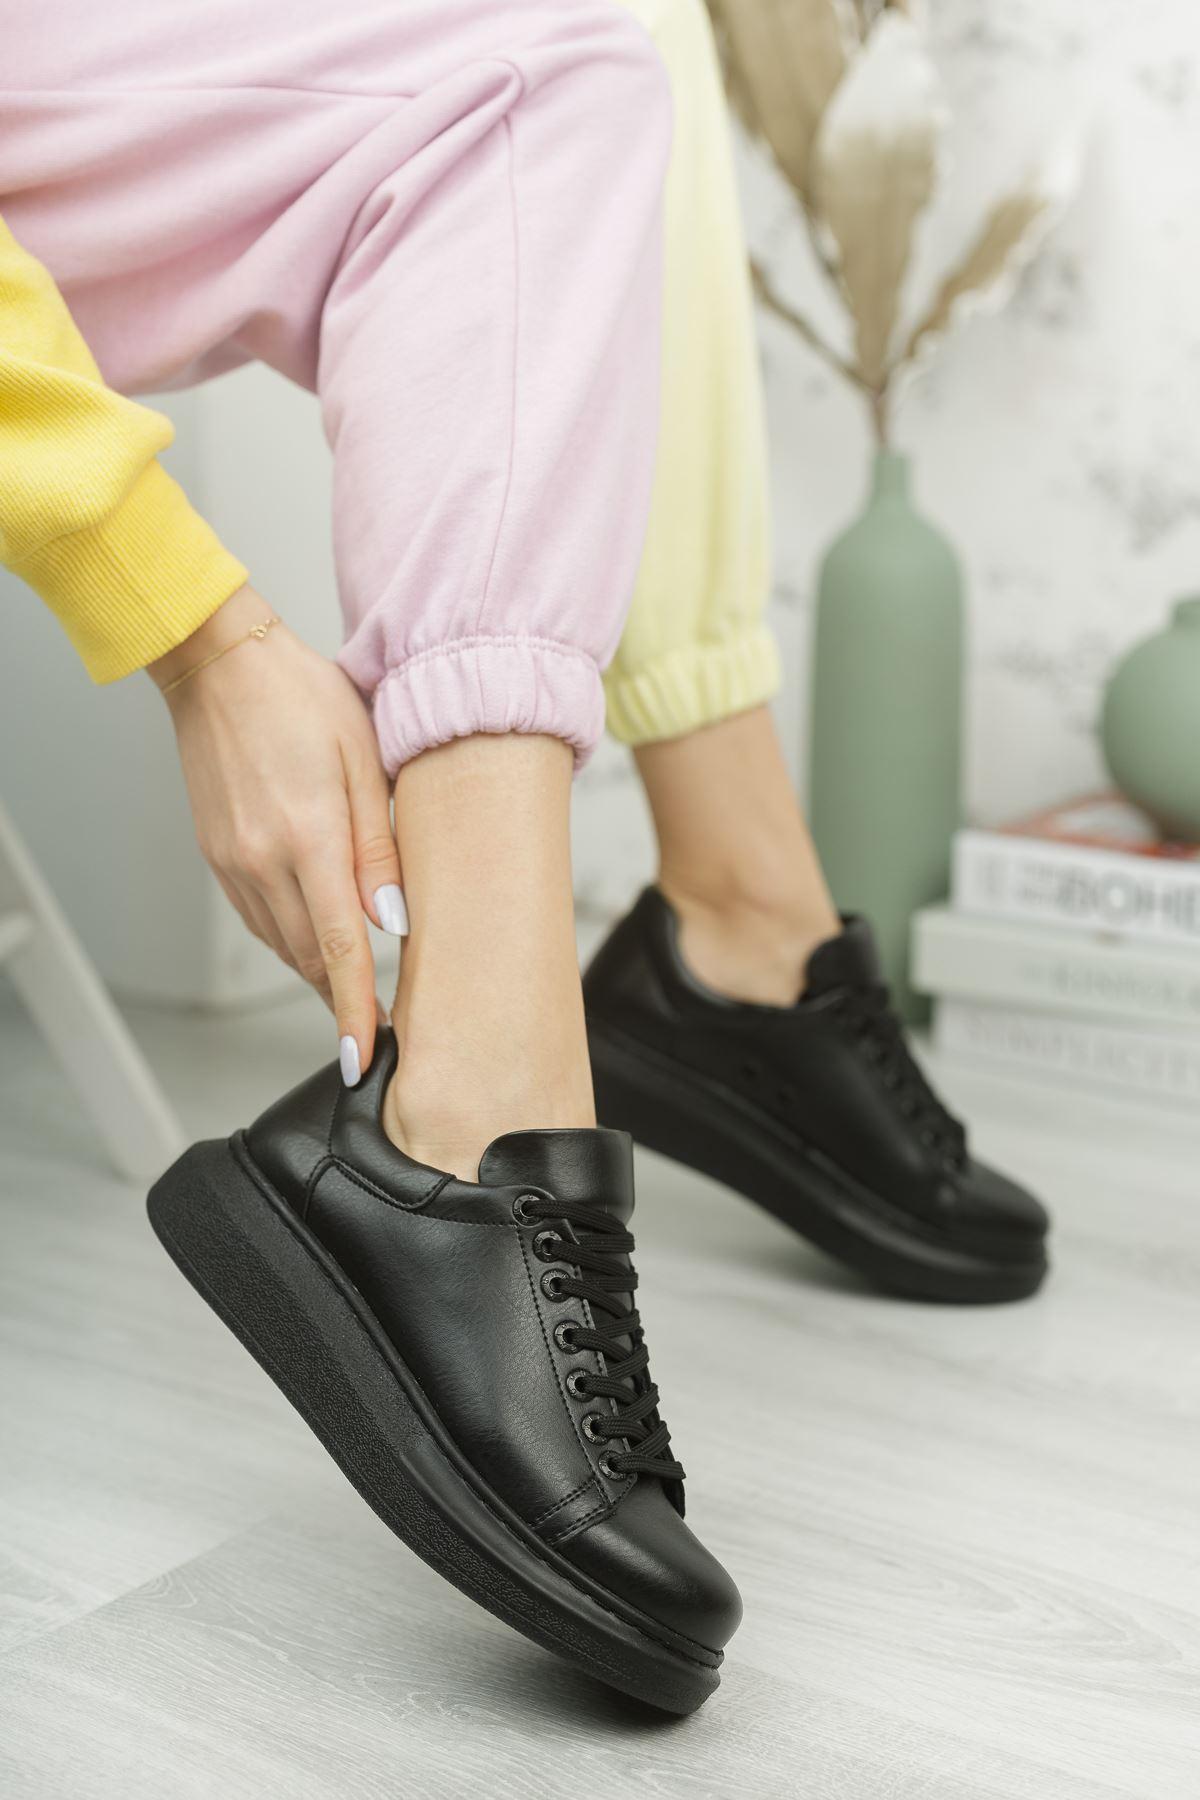 Chekich CH257 ST Kadın Ayakkabı SIYAH